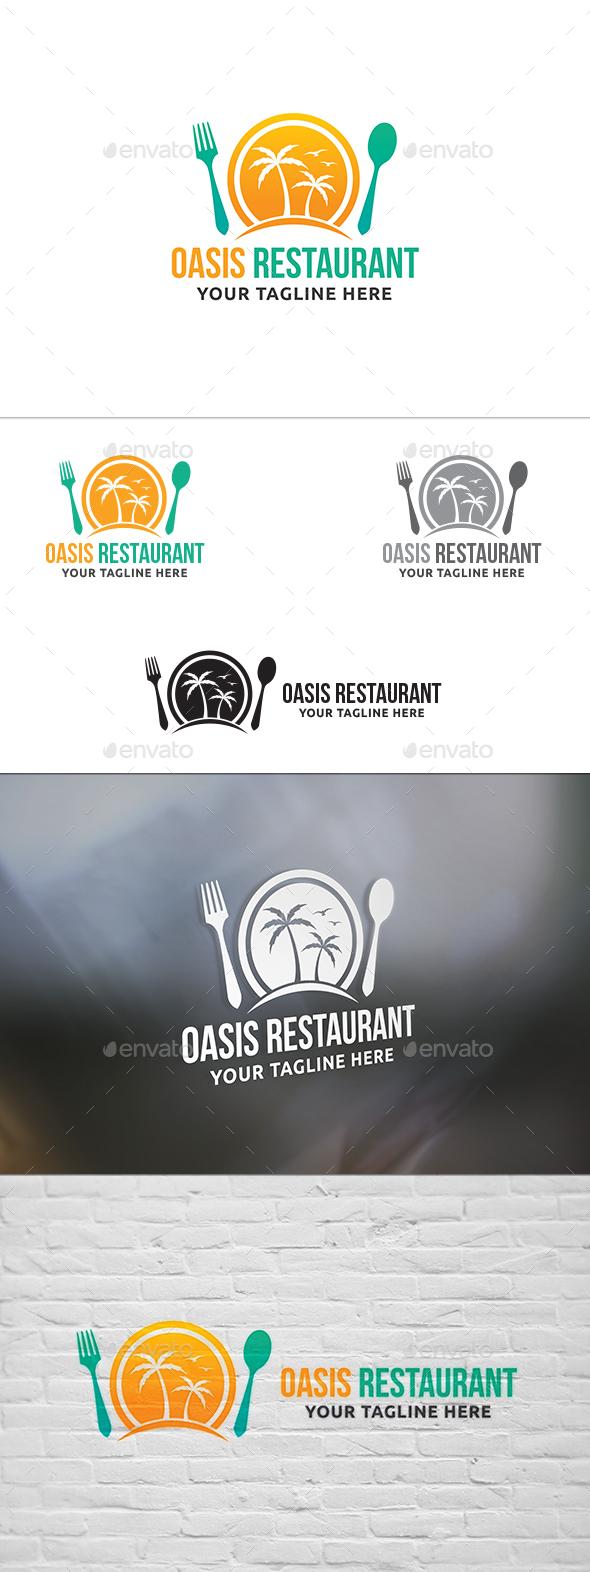 Oasis Restaurant Logo - Restaurant Logo Templates